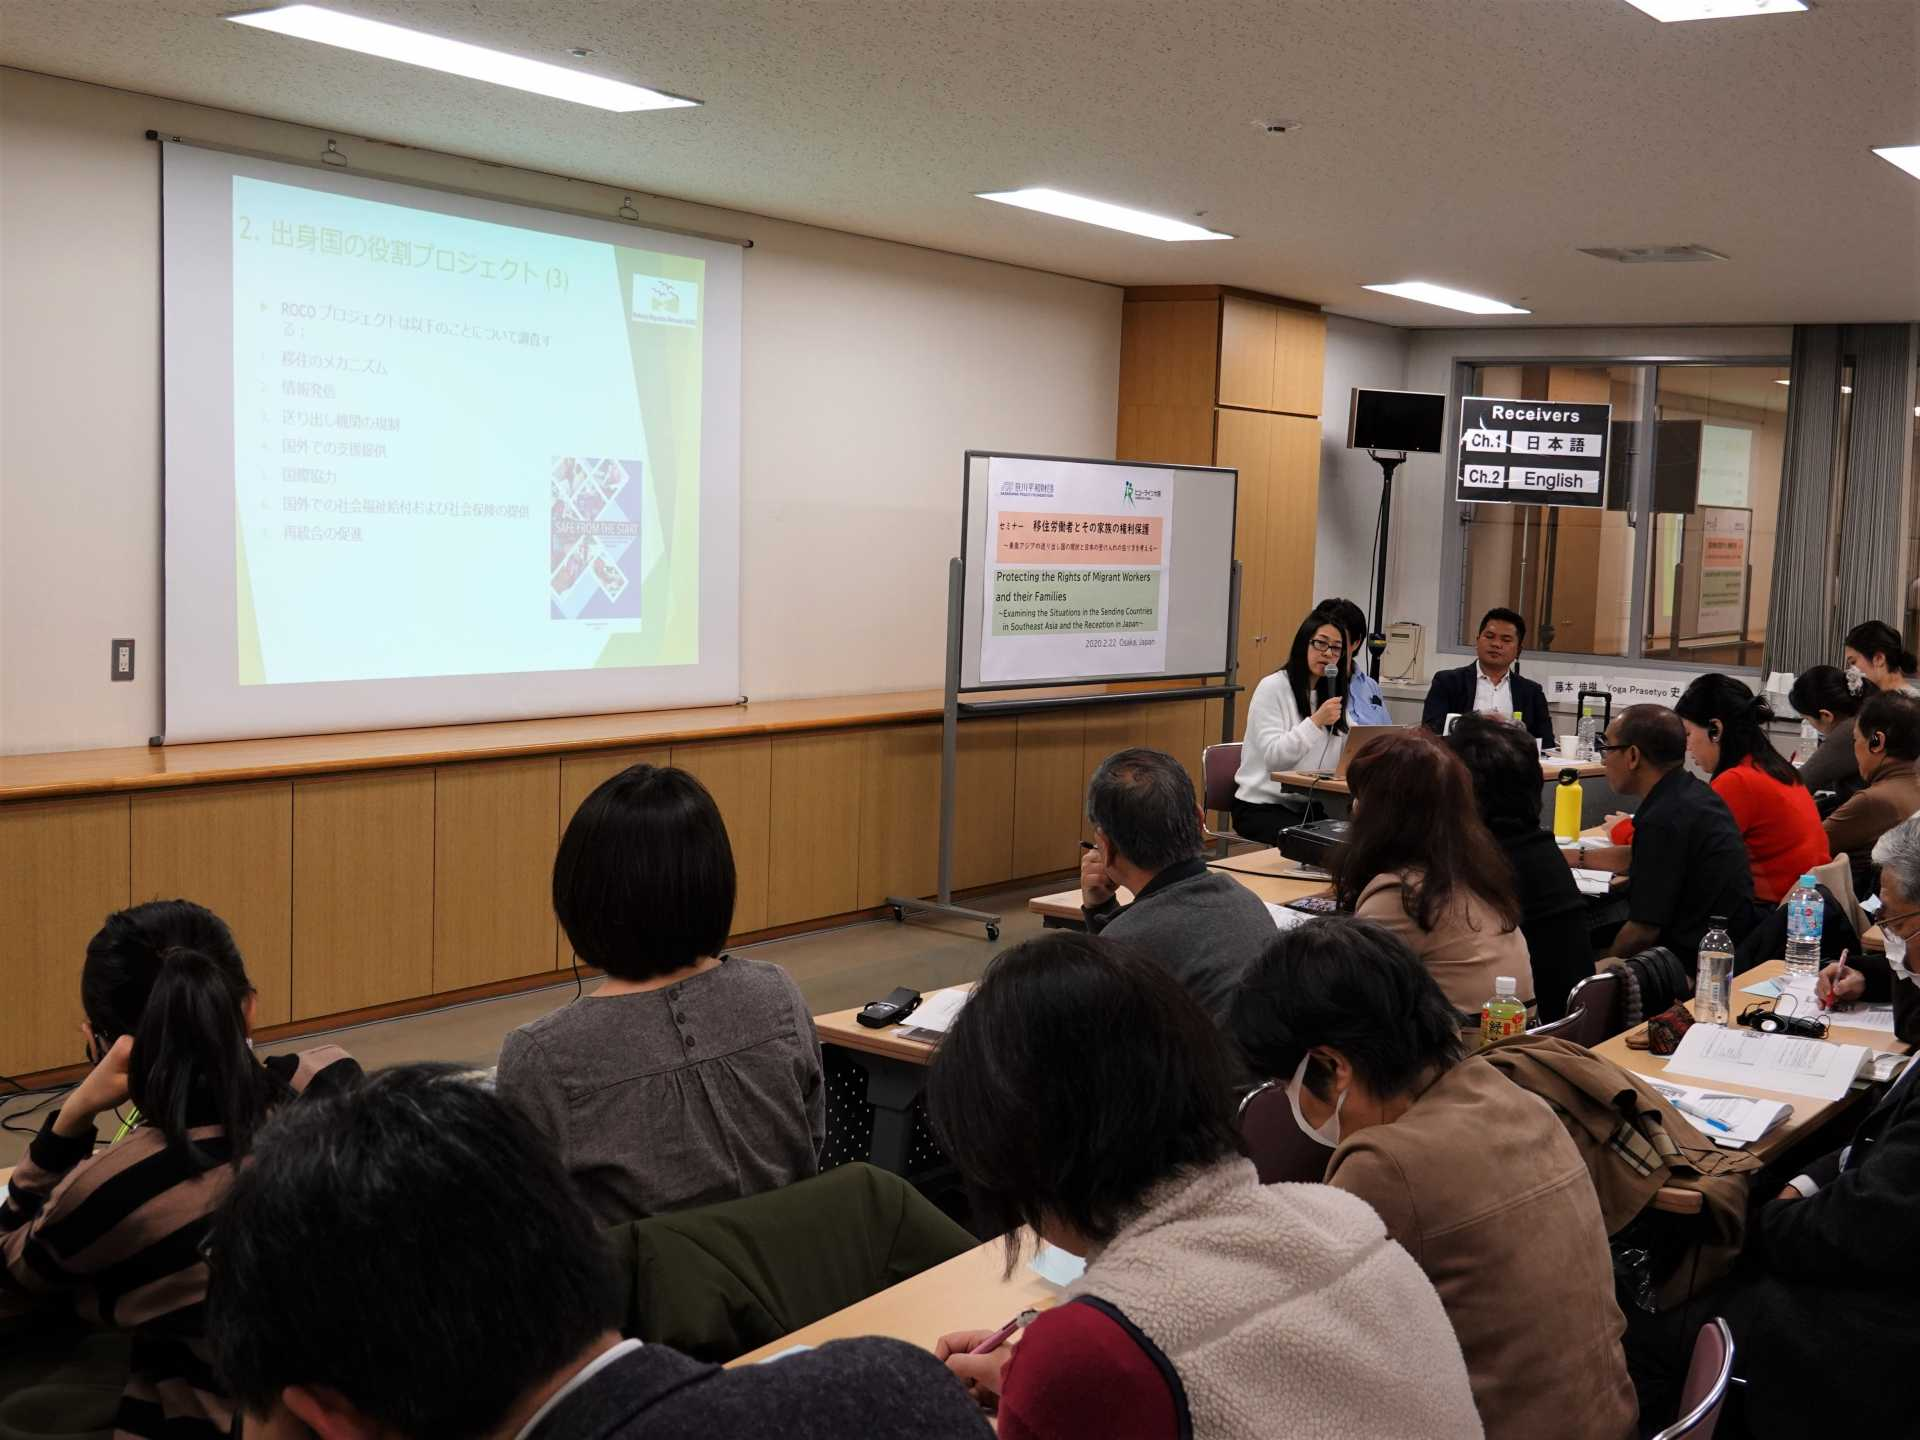 View of the seminar